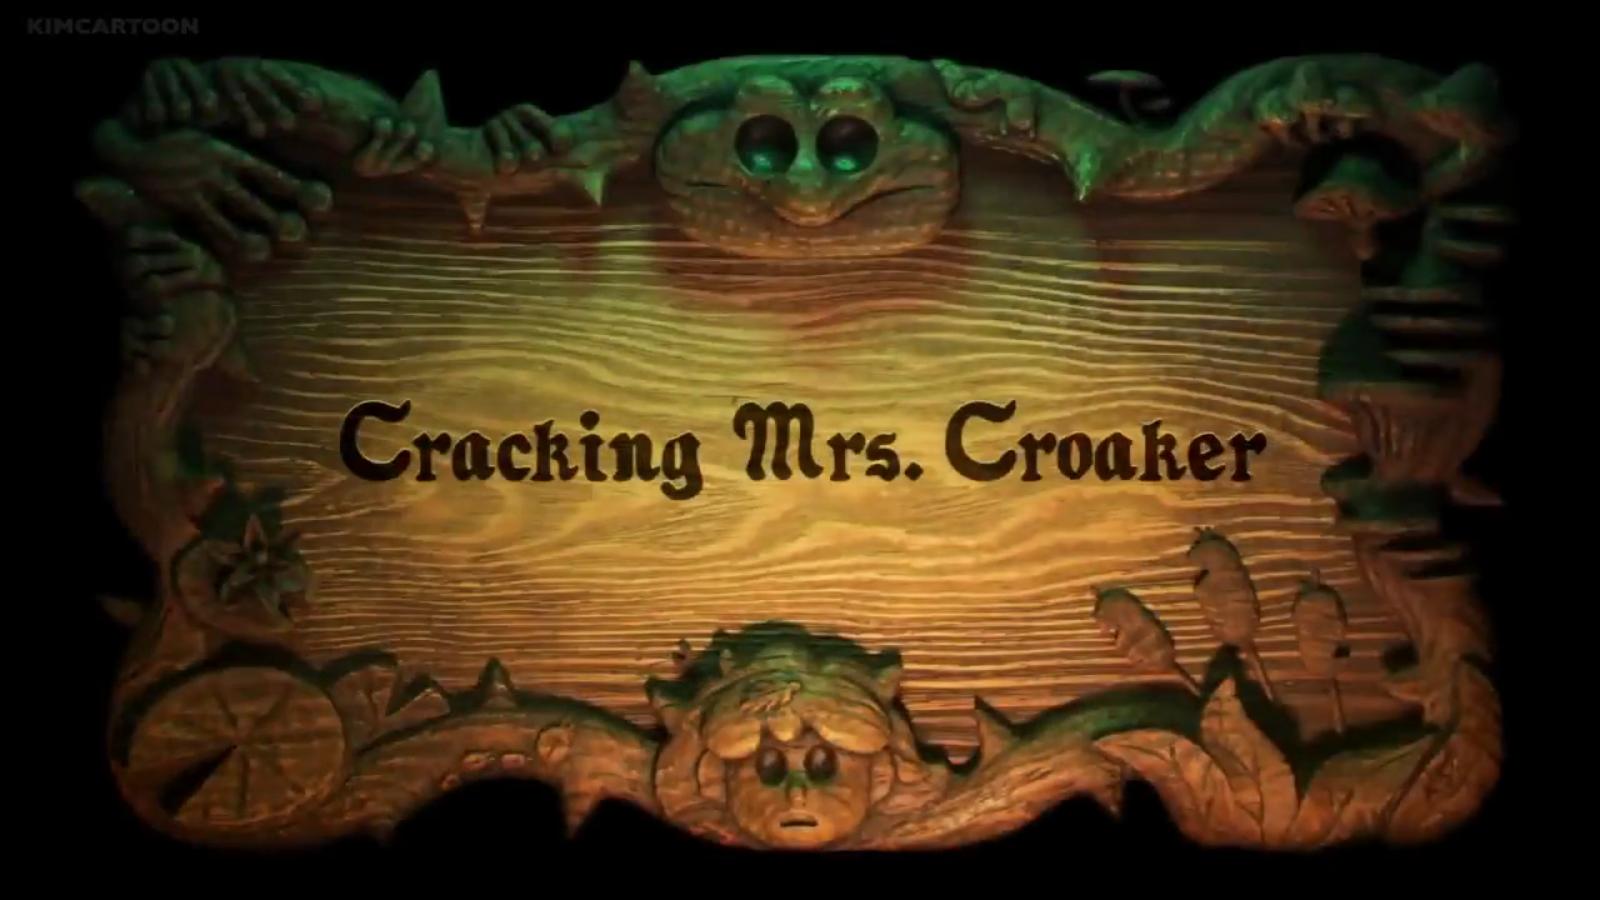 Cracking Mrs. Croaker.png